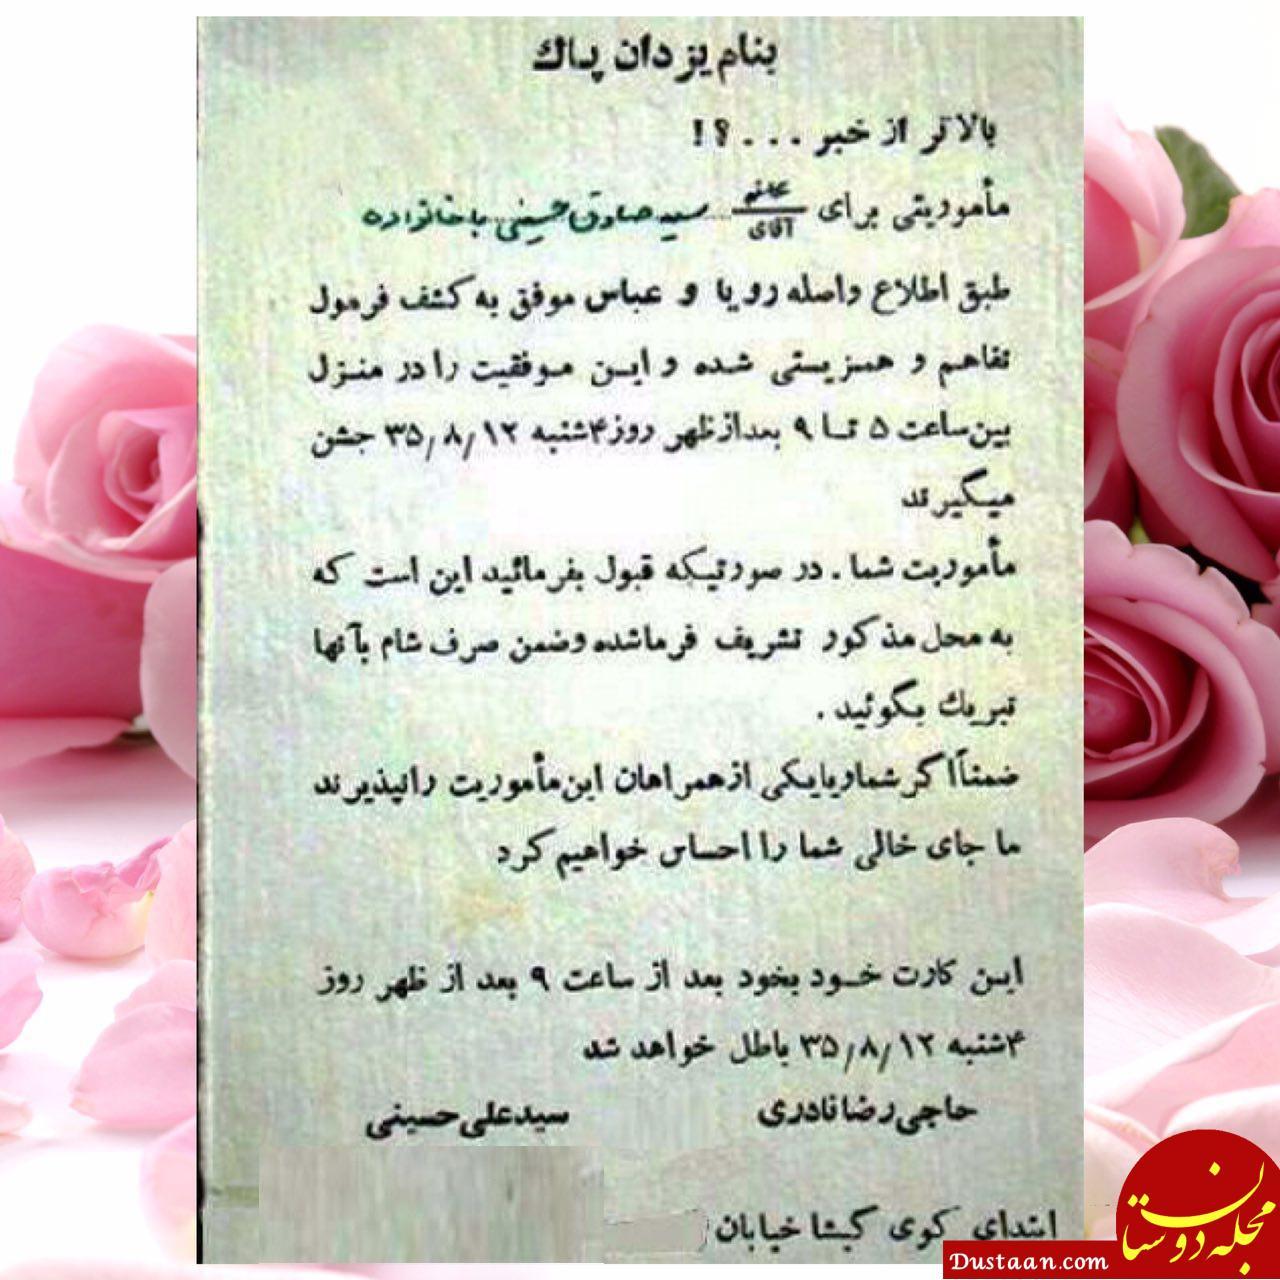 www.dustaan.com کارت عروسی متفاوت در ۴۰ سال پیش! +عکس